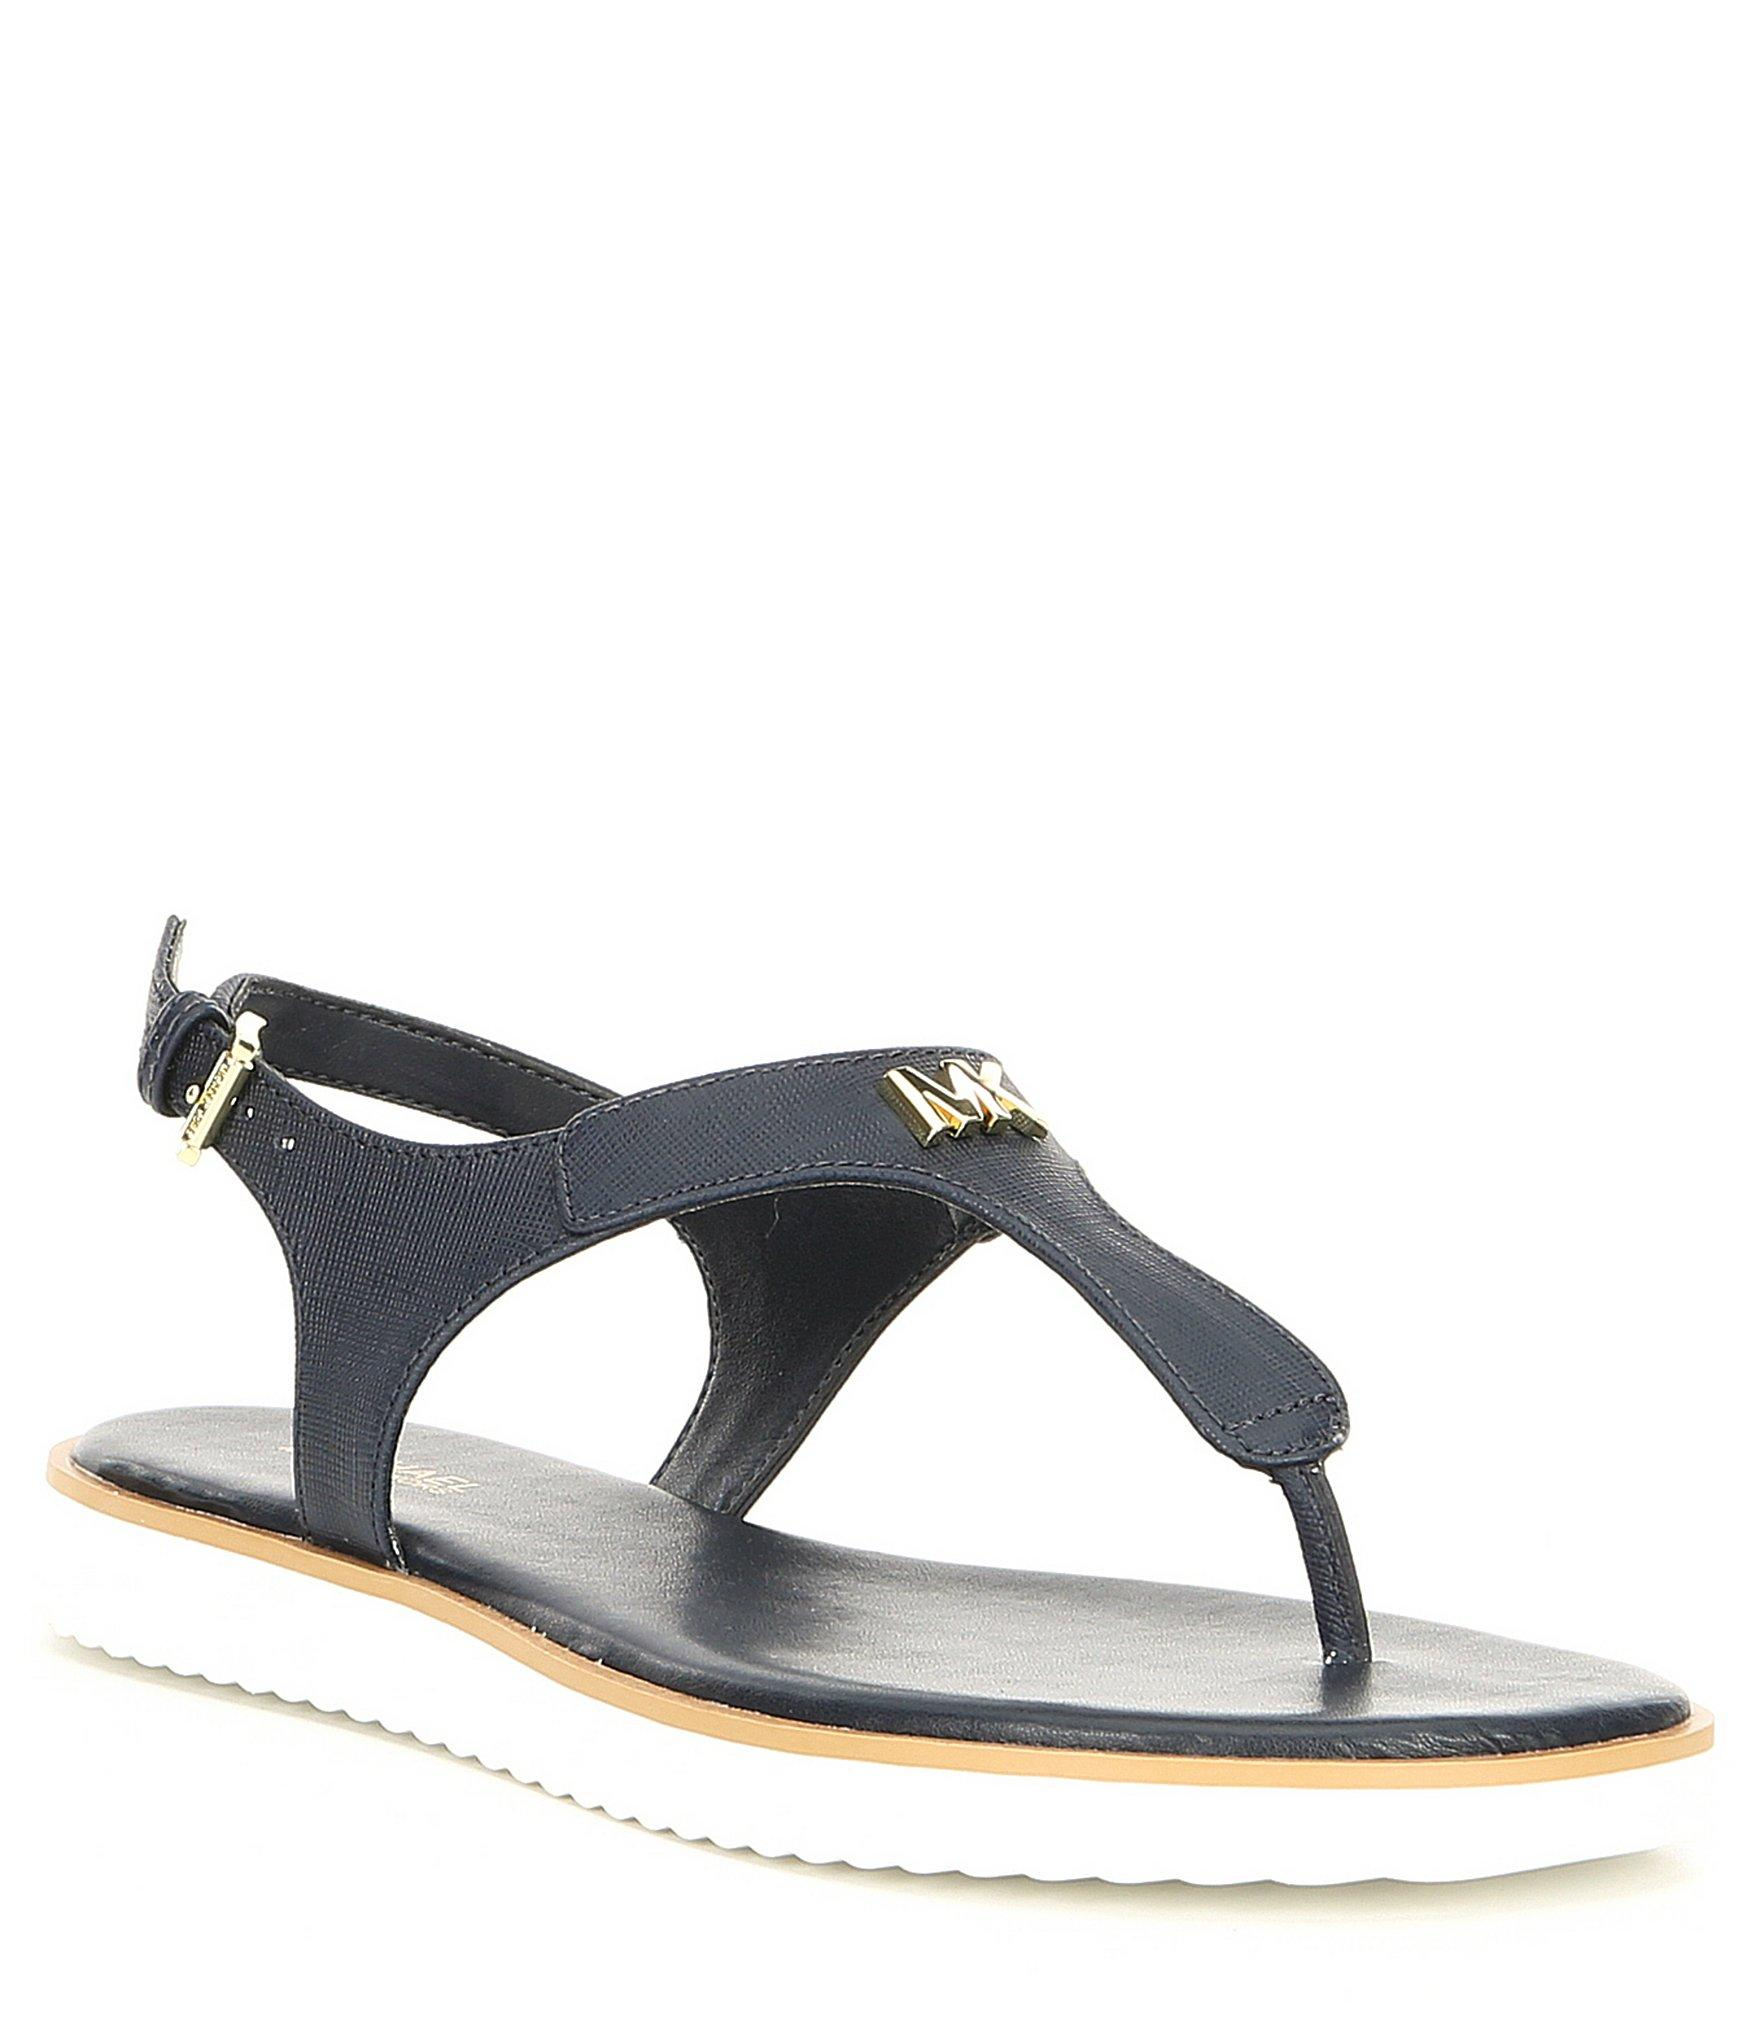 79e1244f0d6 Lyst - MICHAEL Michael Kors Brady Saffiano Leather Thong Sandals in Blue